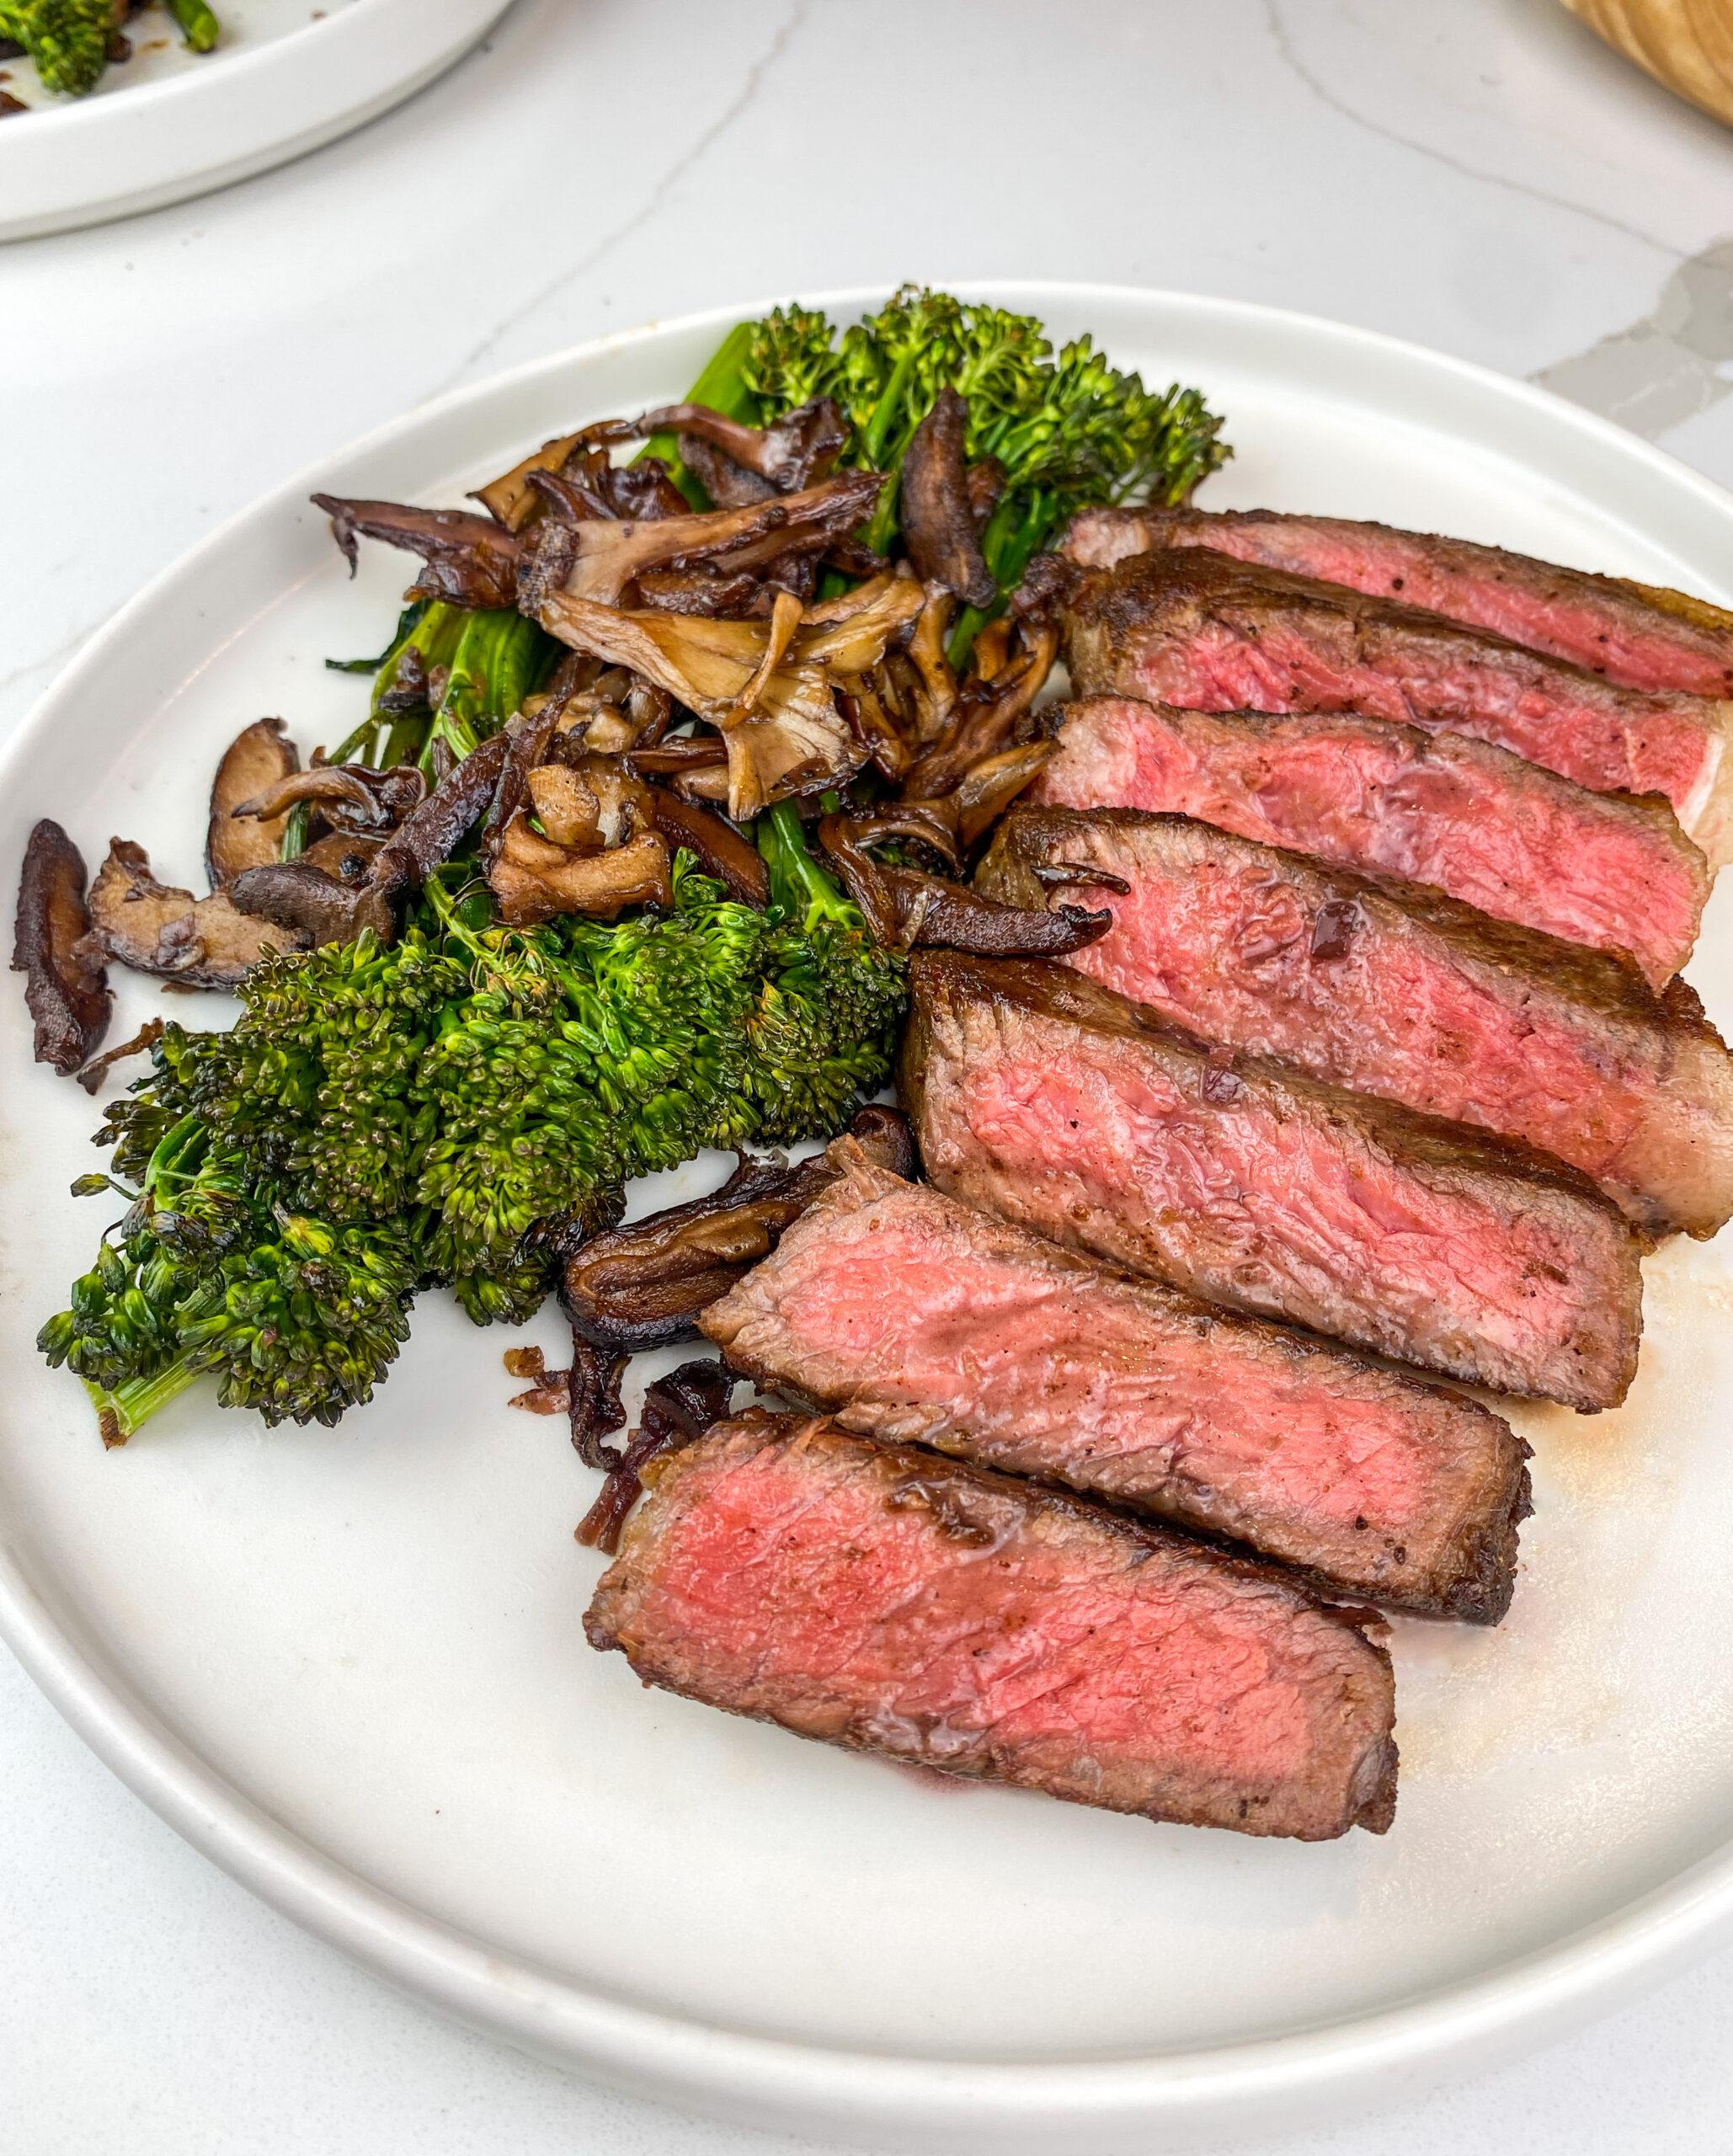 pan seared steak with red wine glazed mushrooms